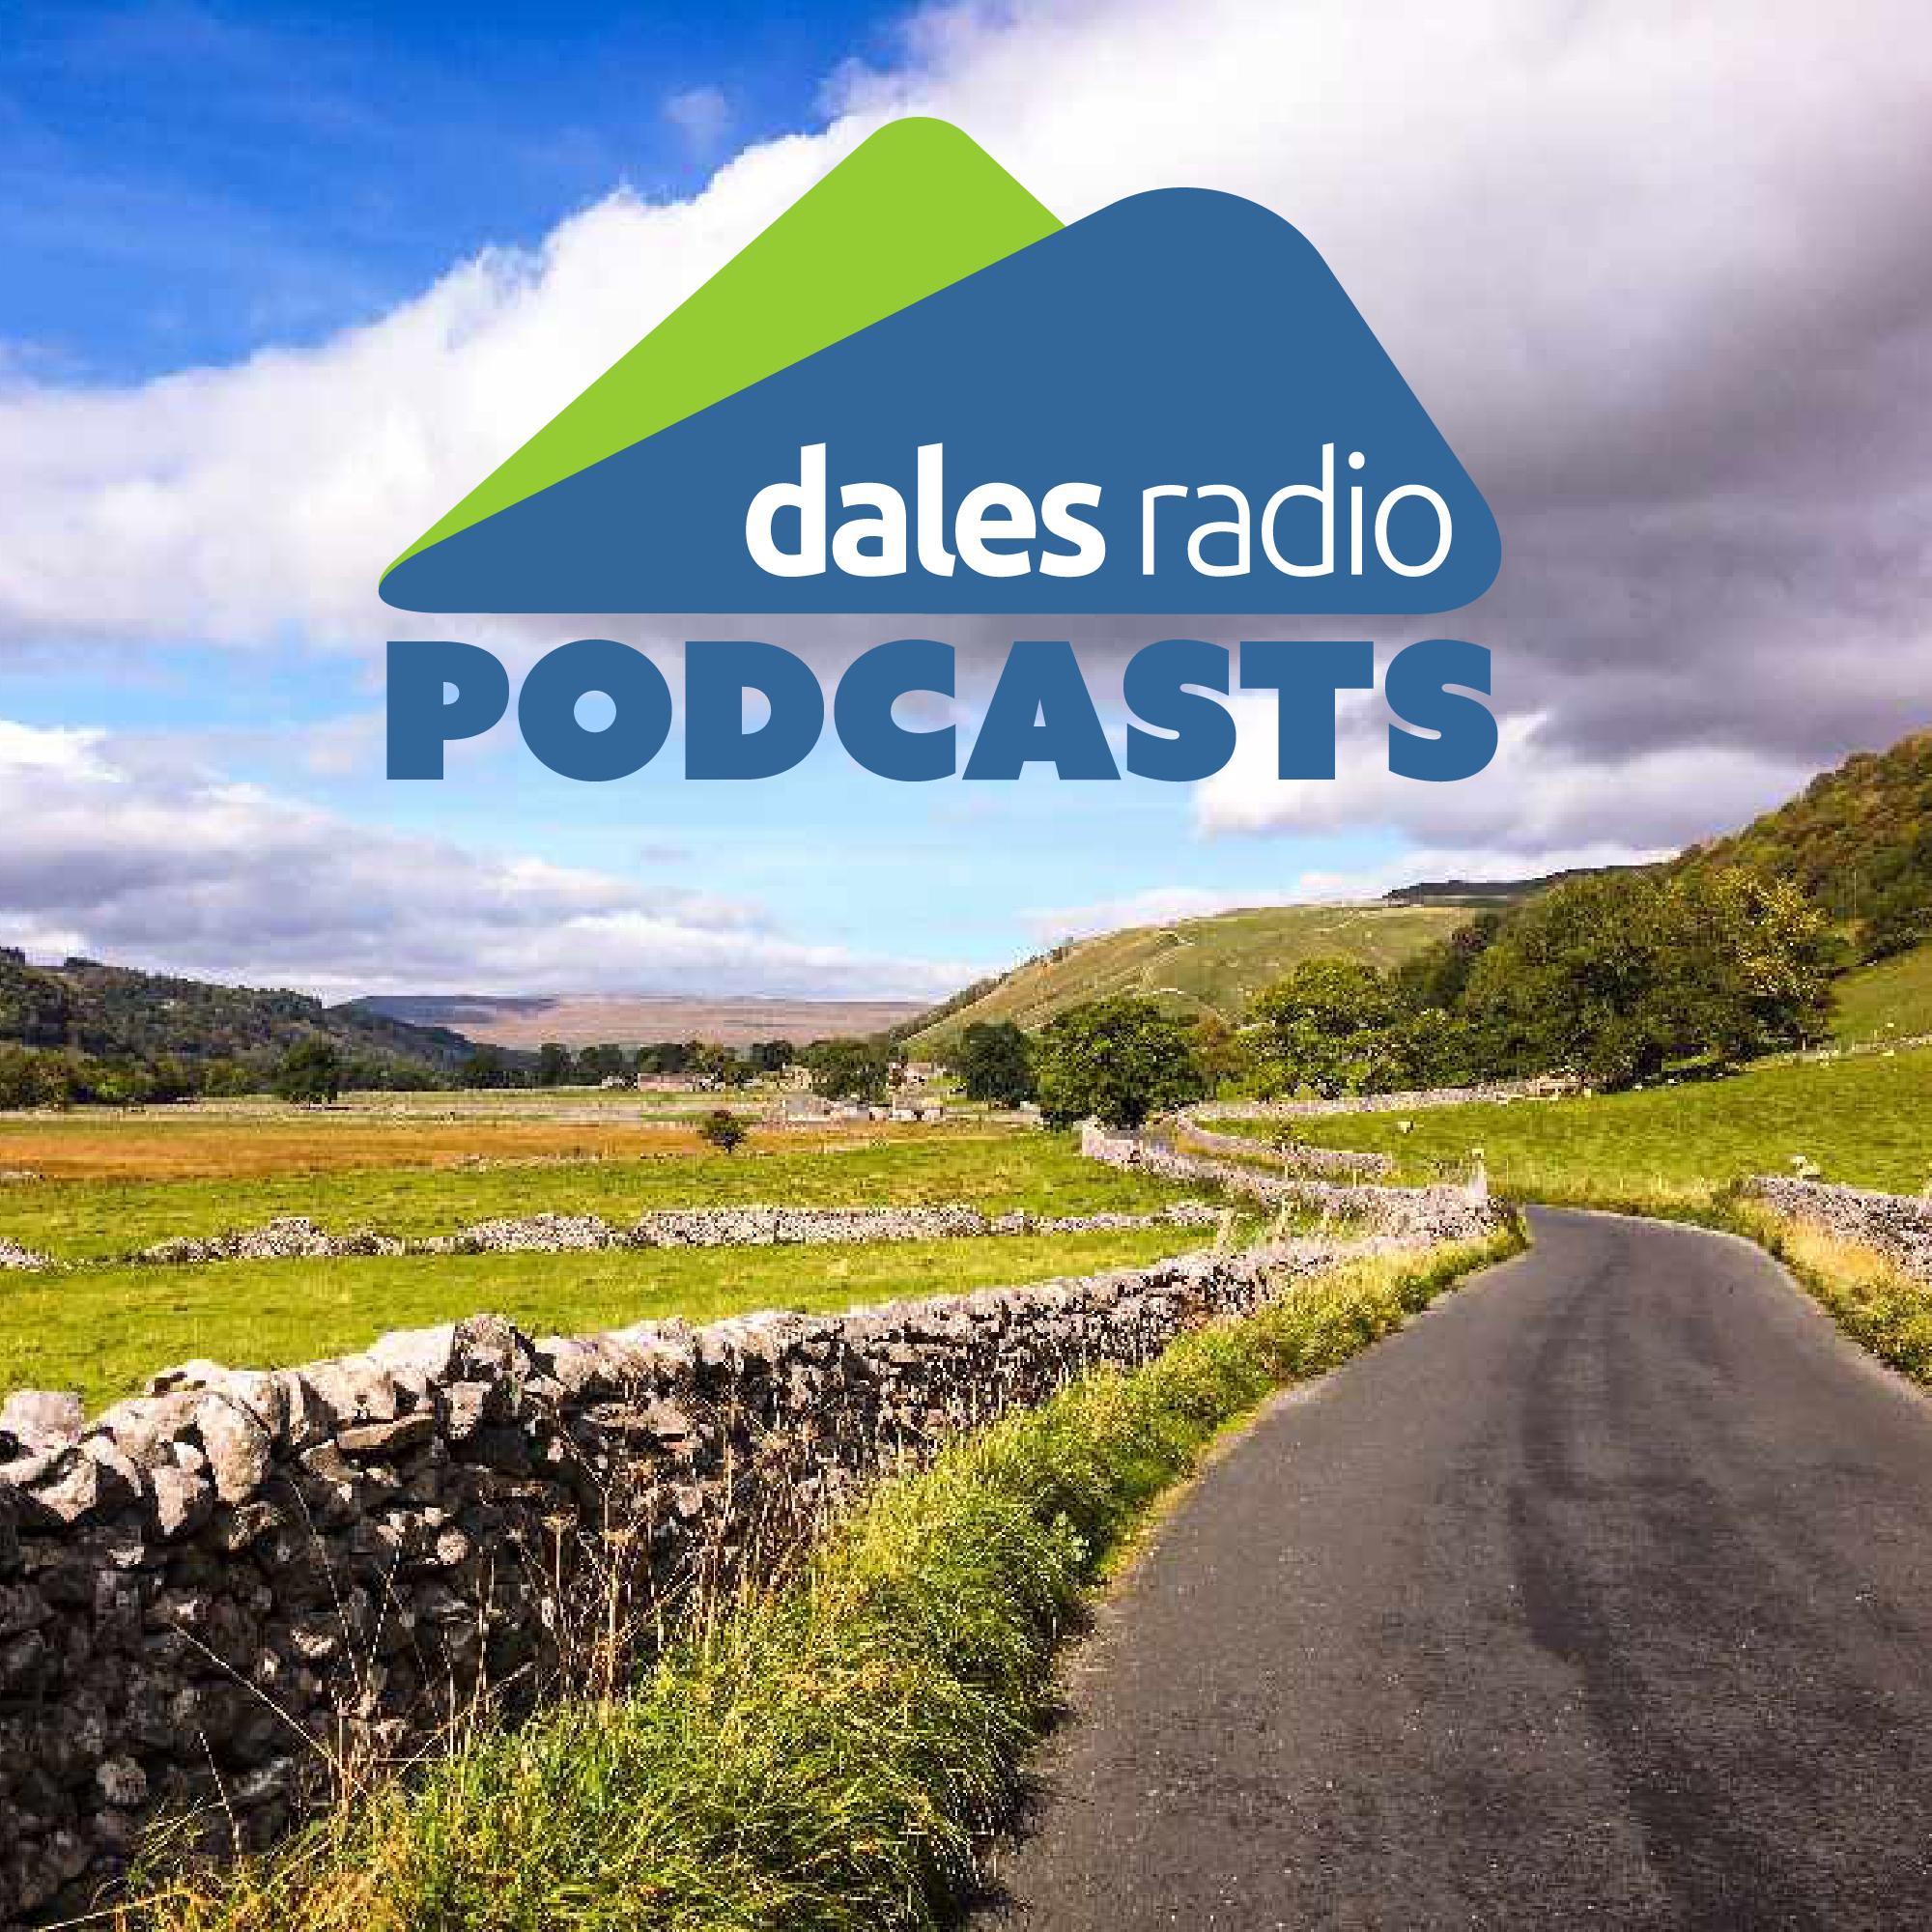 Dales Radio Podcasts